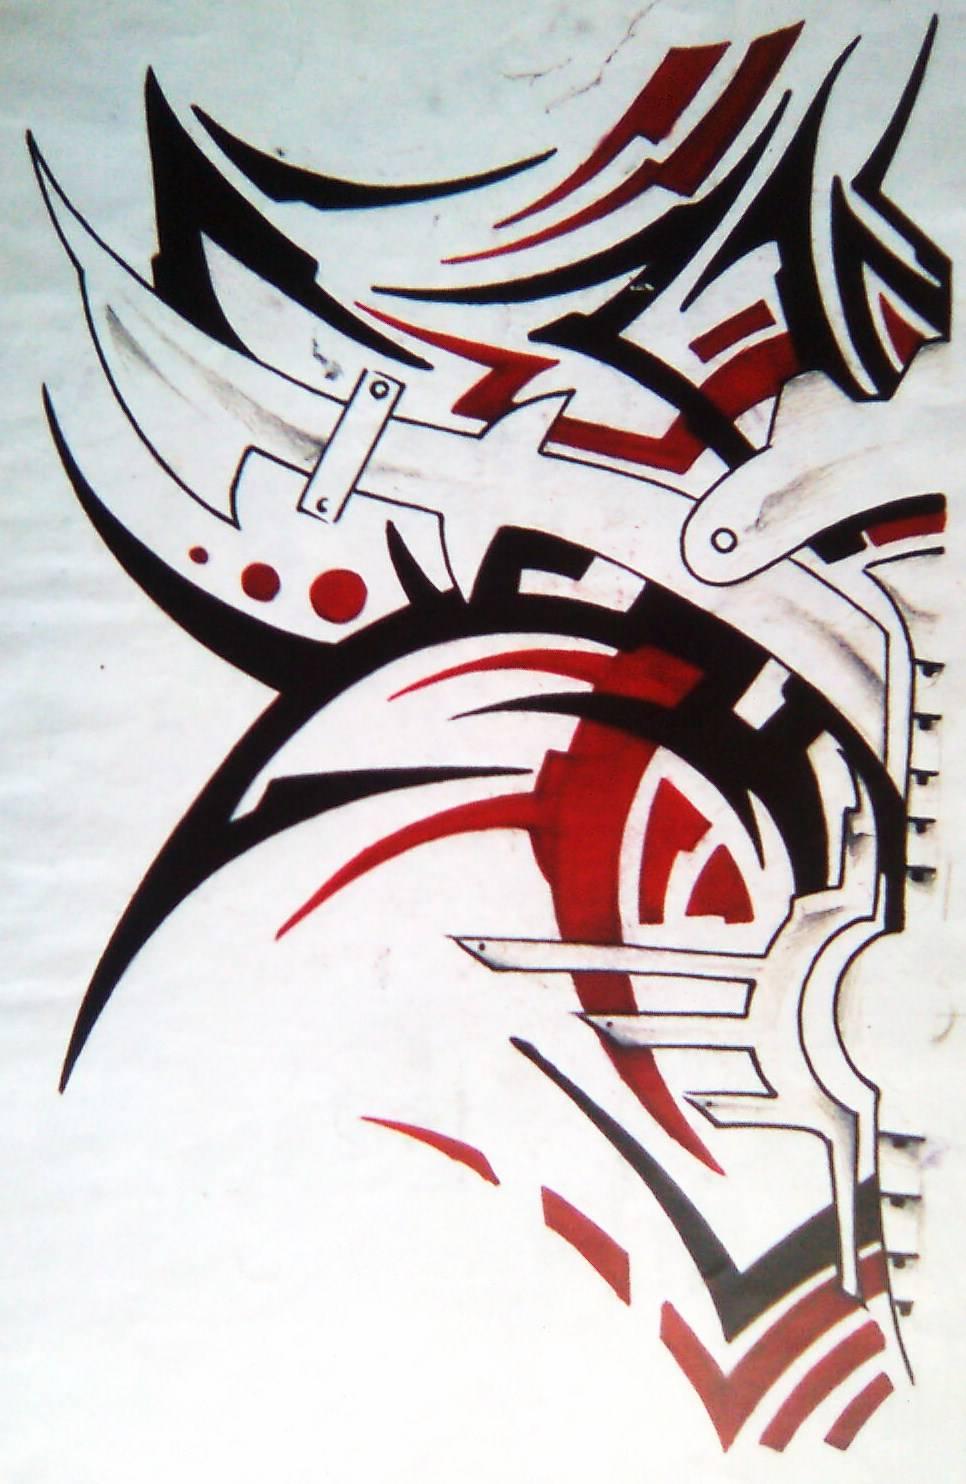 Tribal A Tres Colores Manuel Morales Sanchez Artelistacom